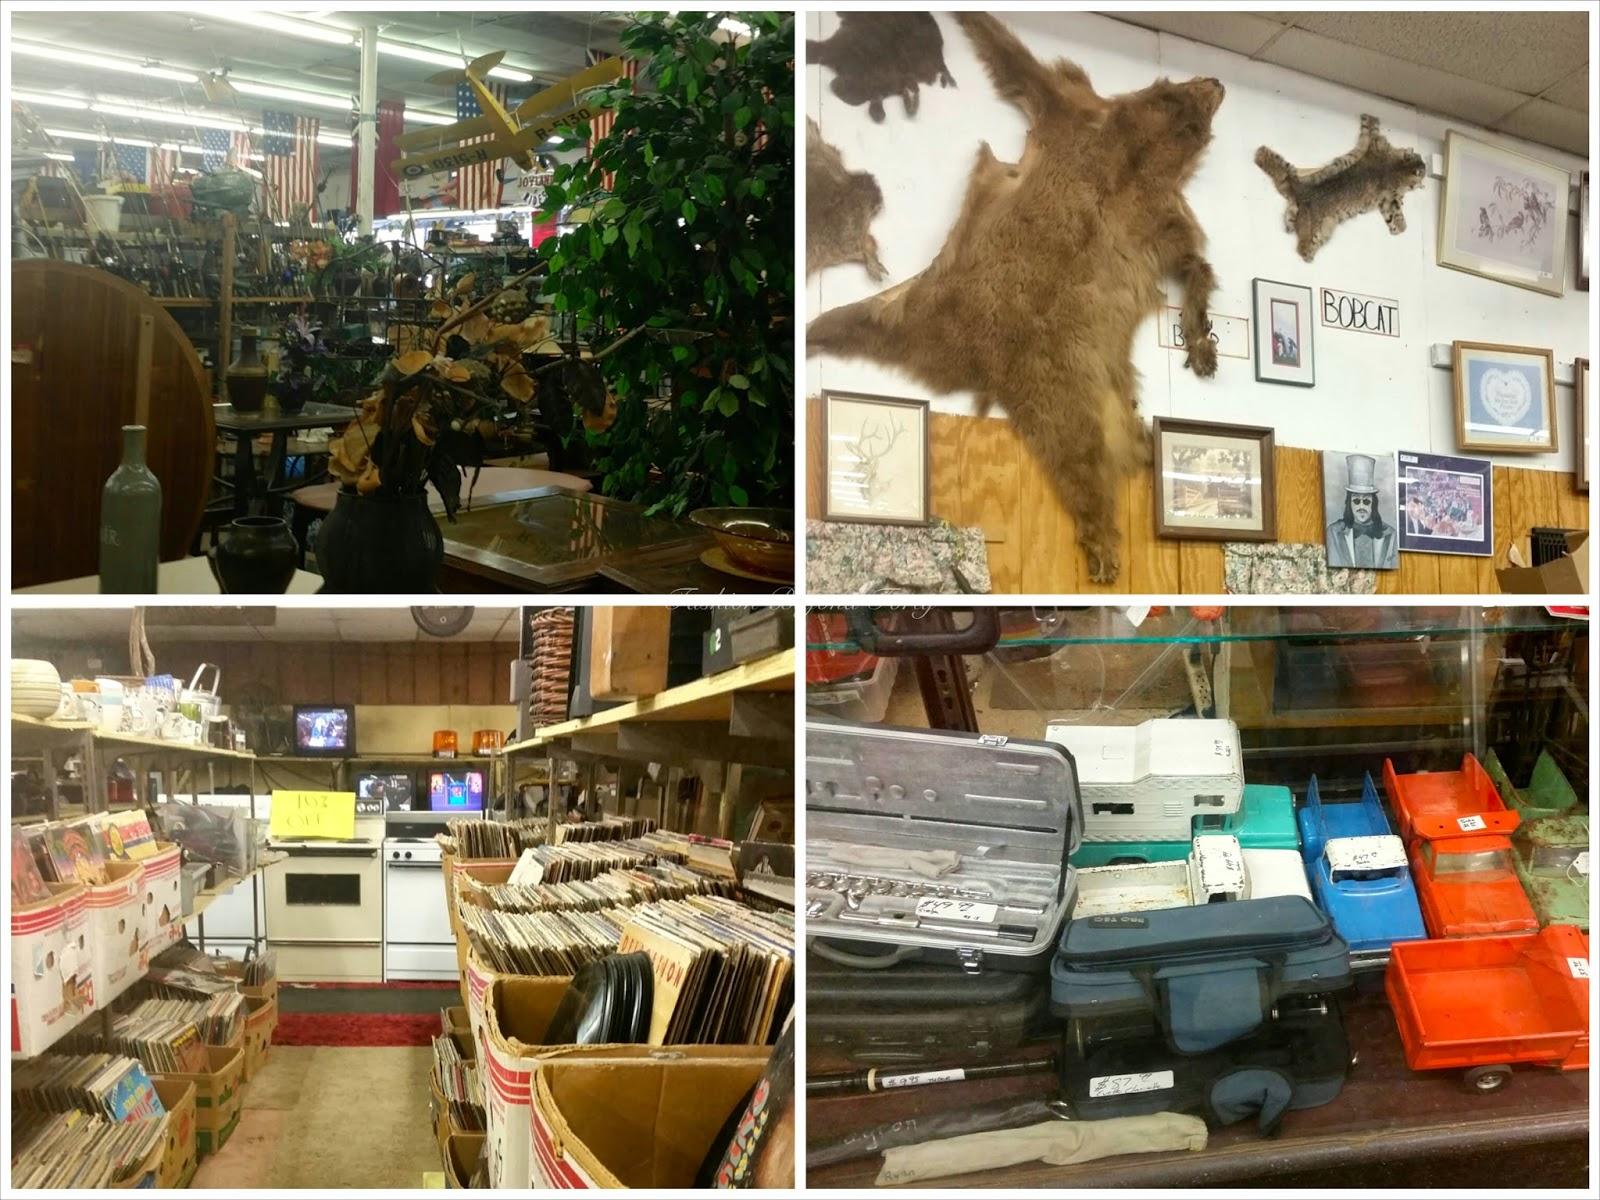 Boyles Joyland Flea Market Topeka Kansas - Best Flea Market